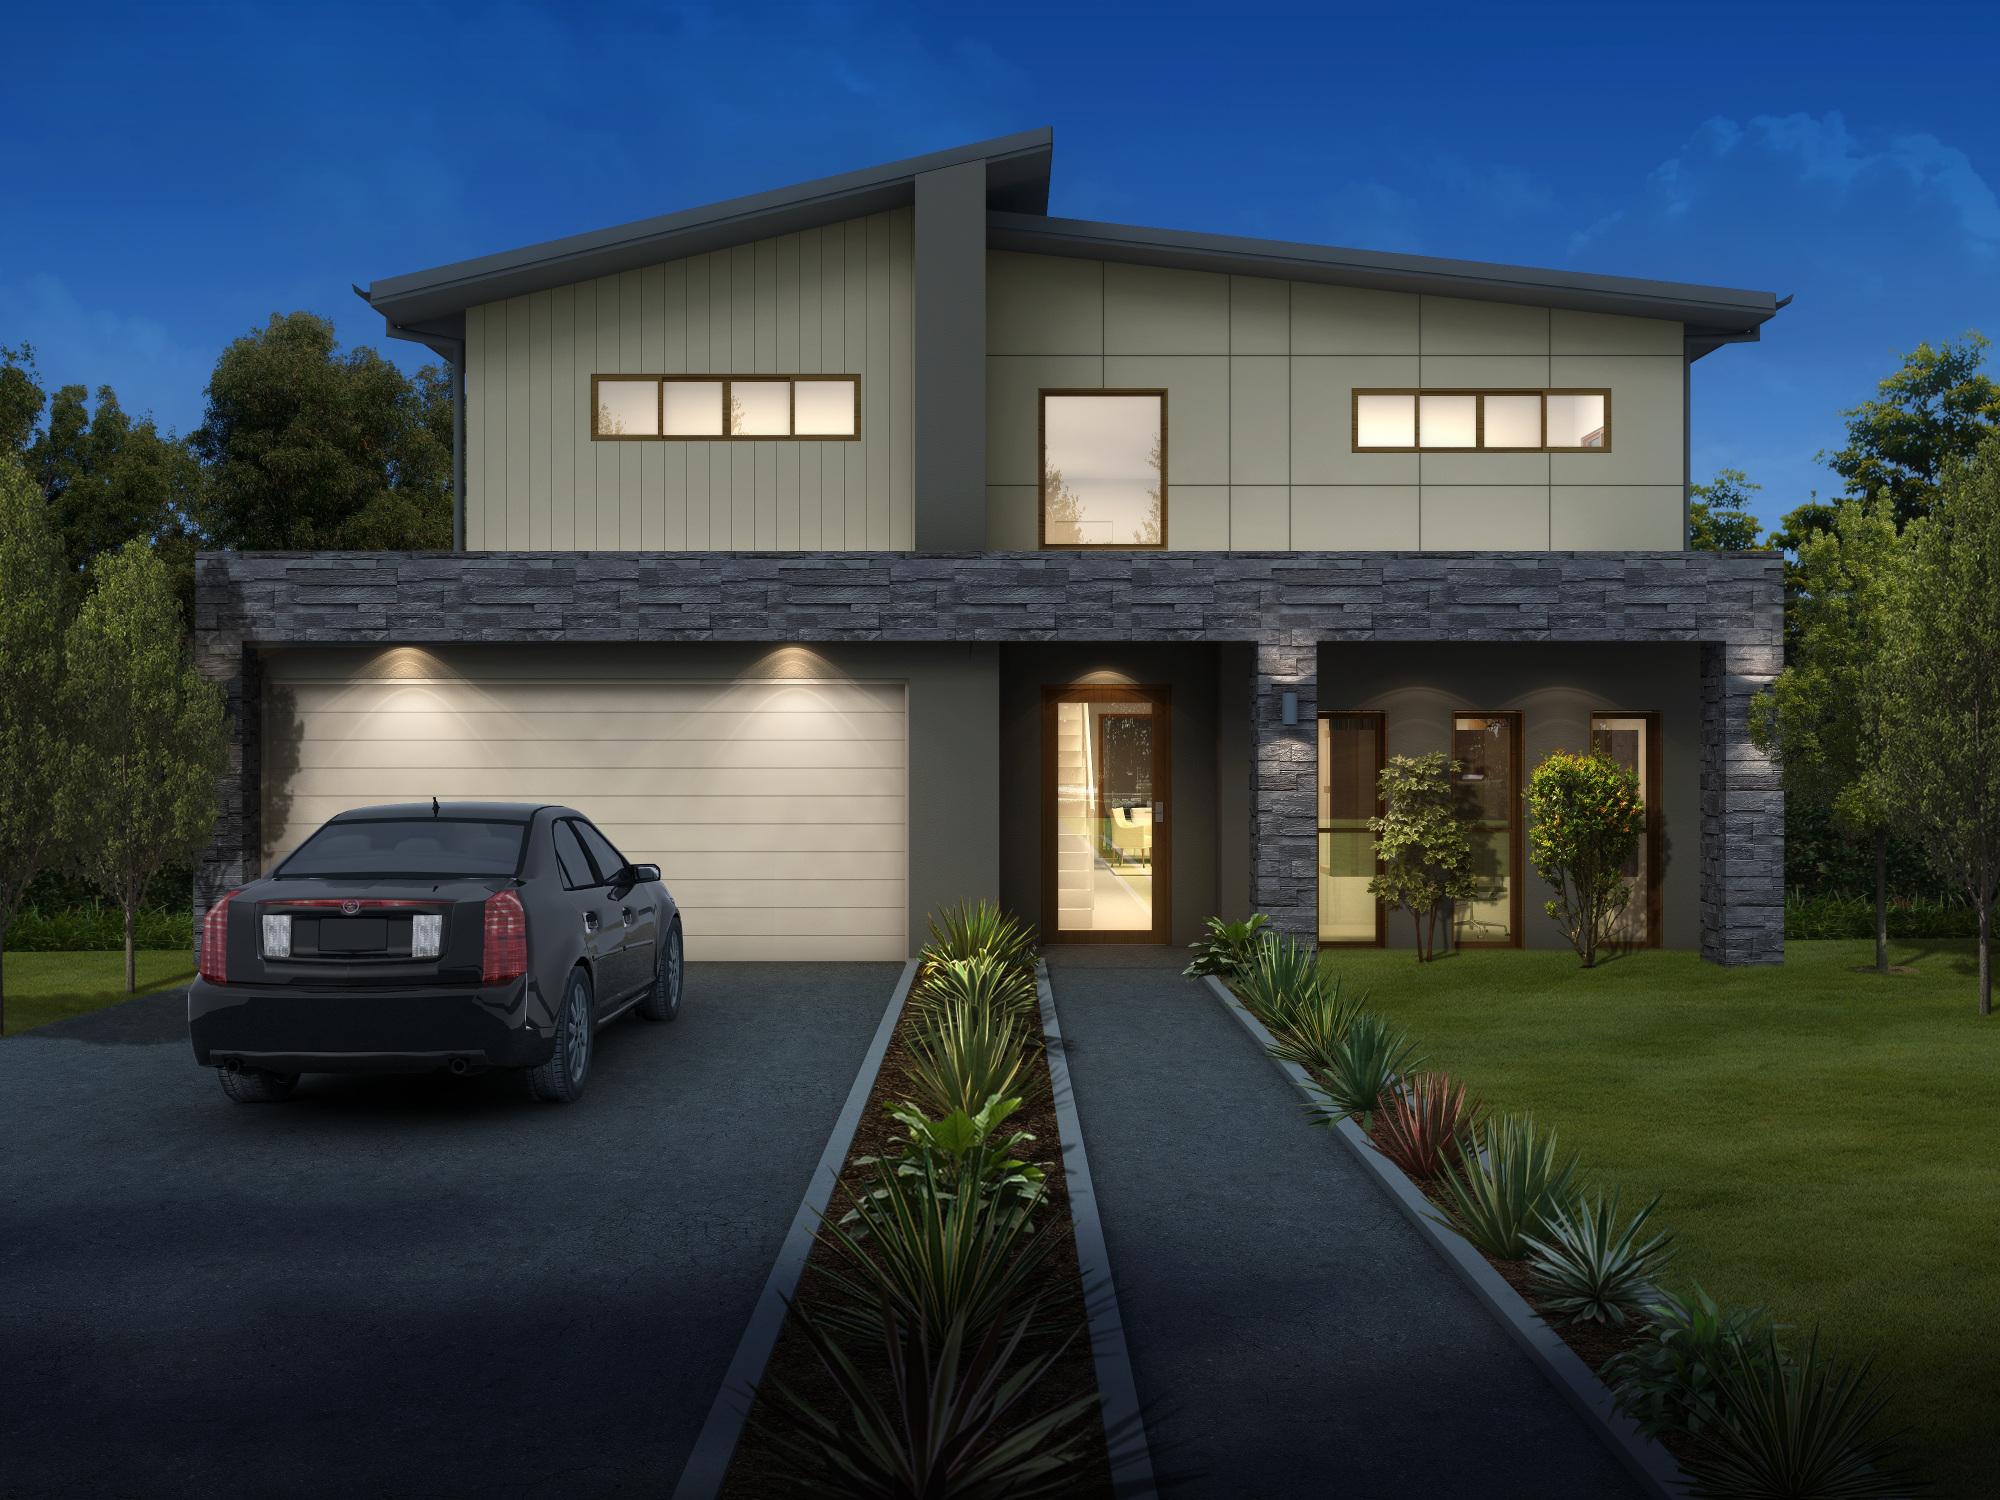 Home Design - Brahe - M4005